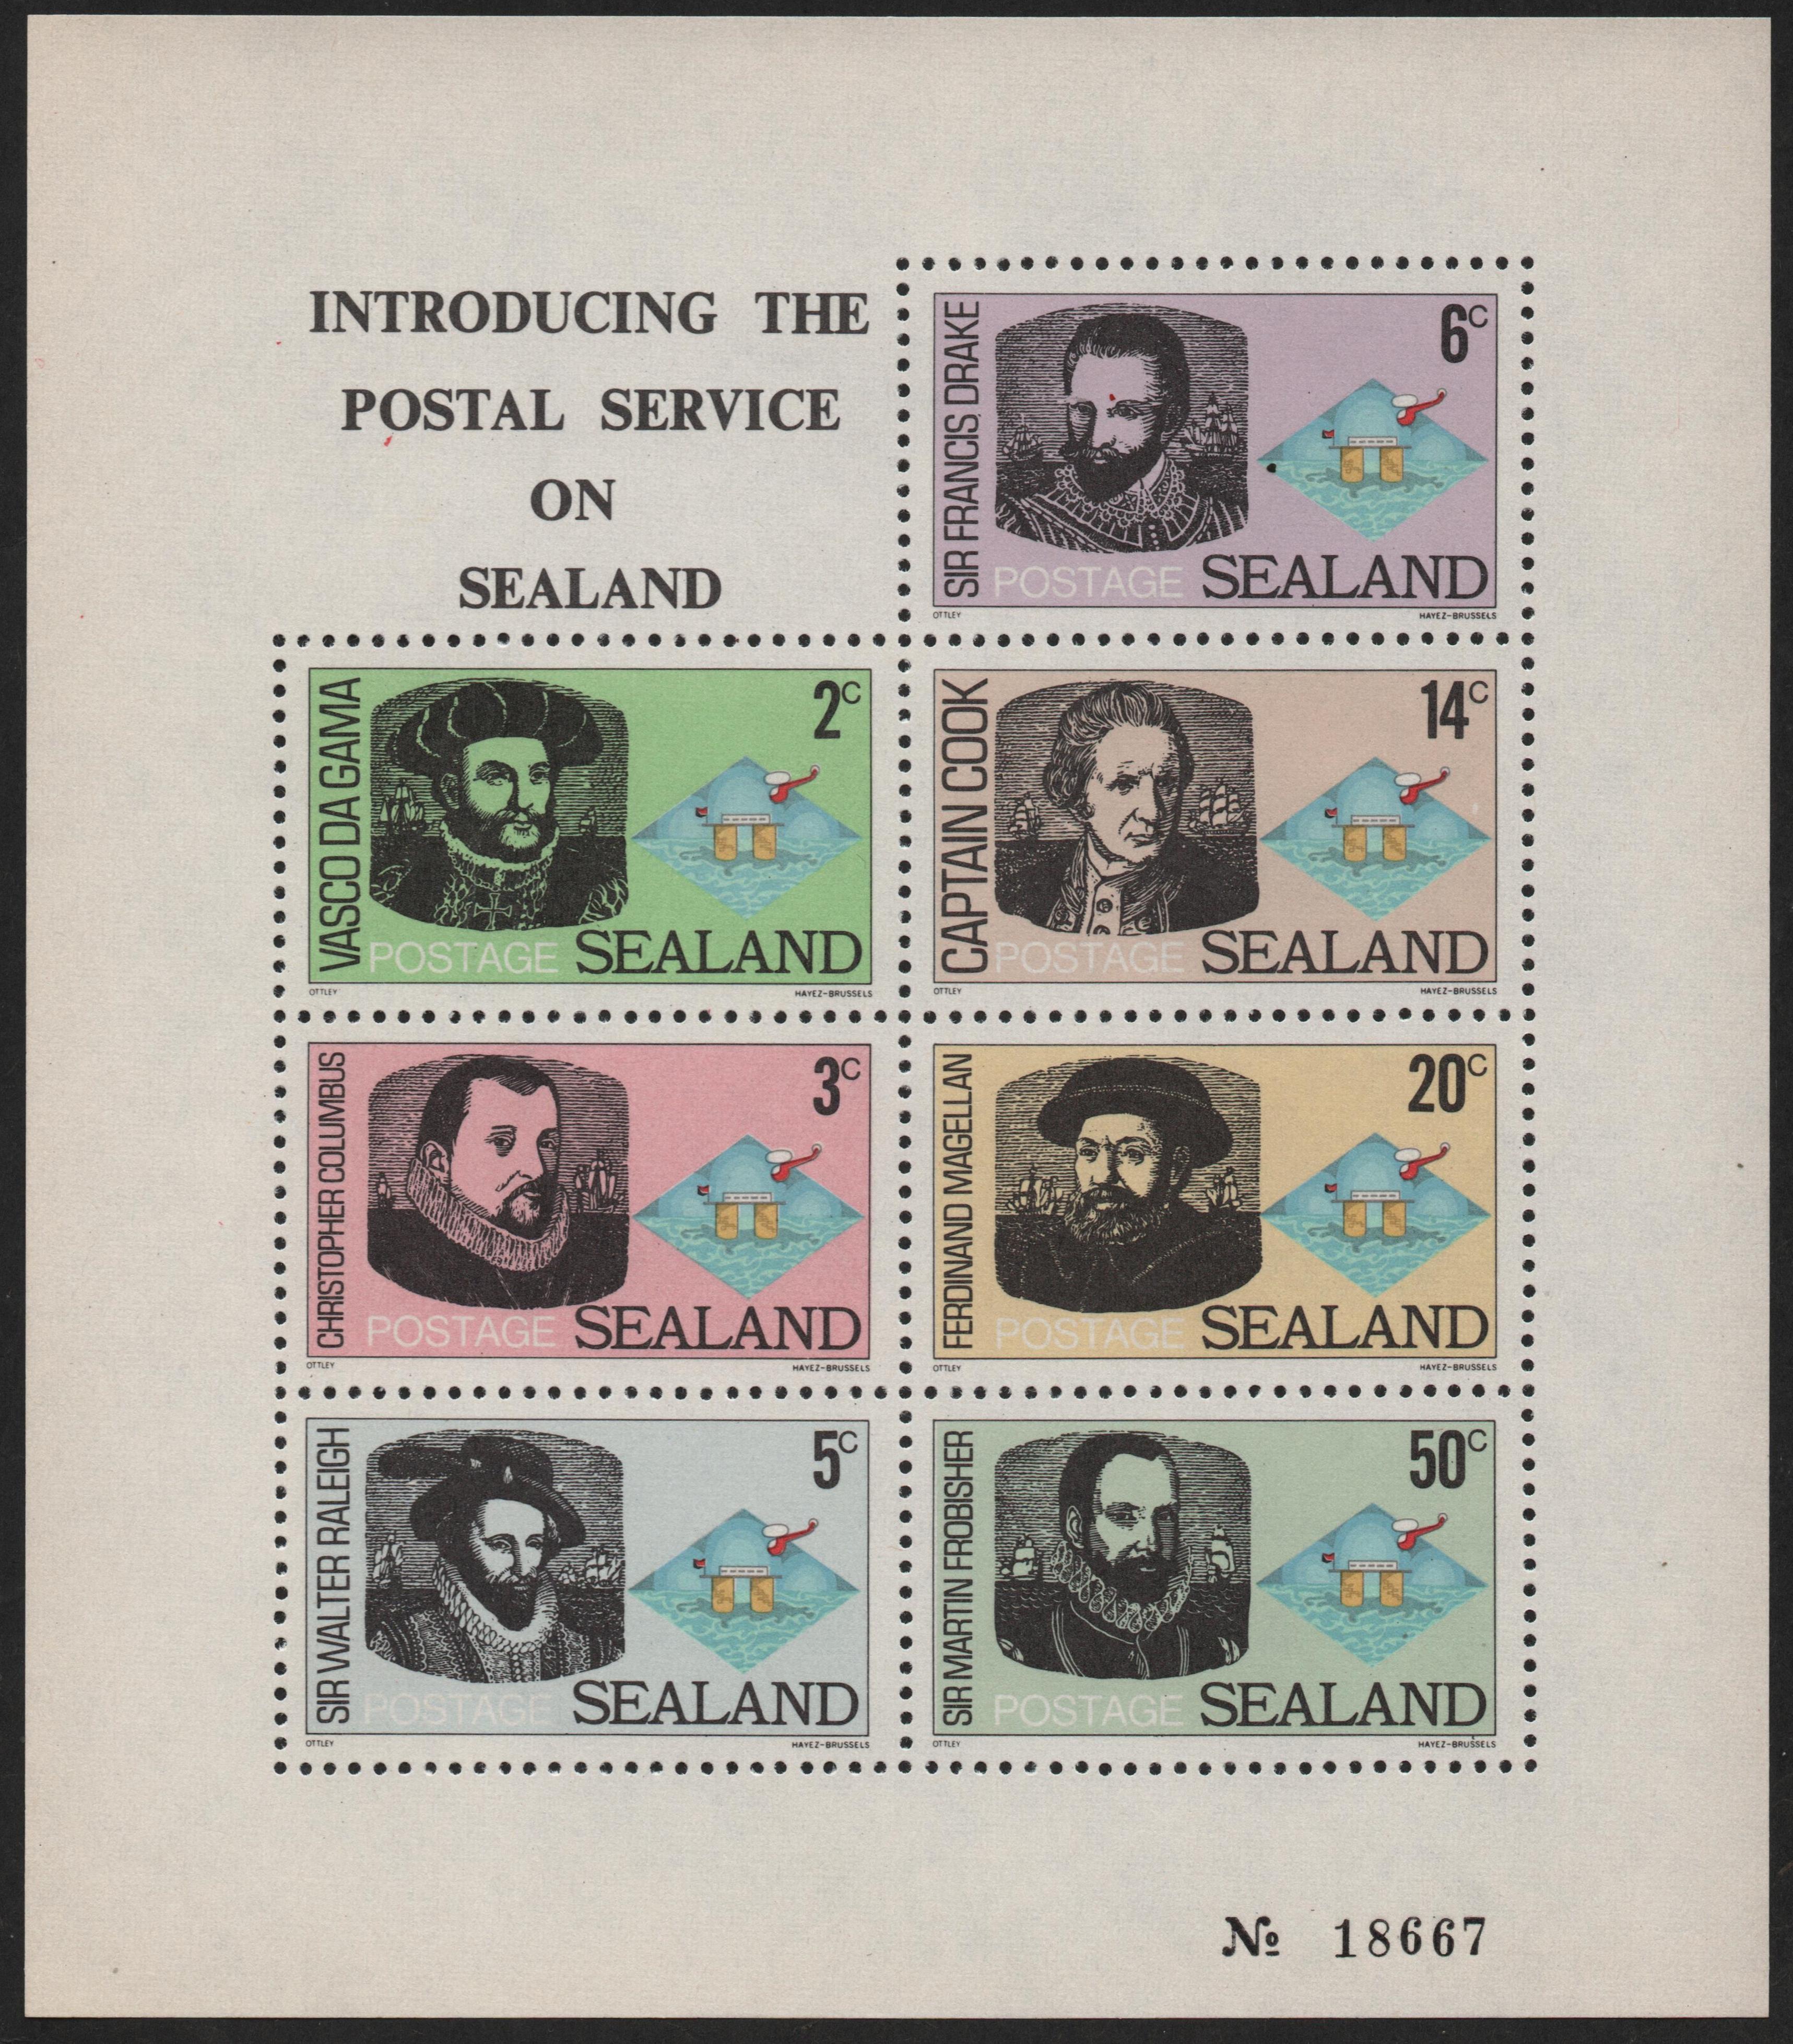 Sealand - Issue #1 (1969) souvenir sheet